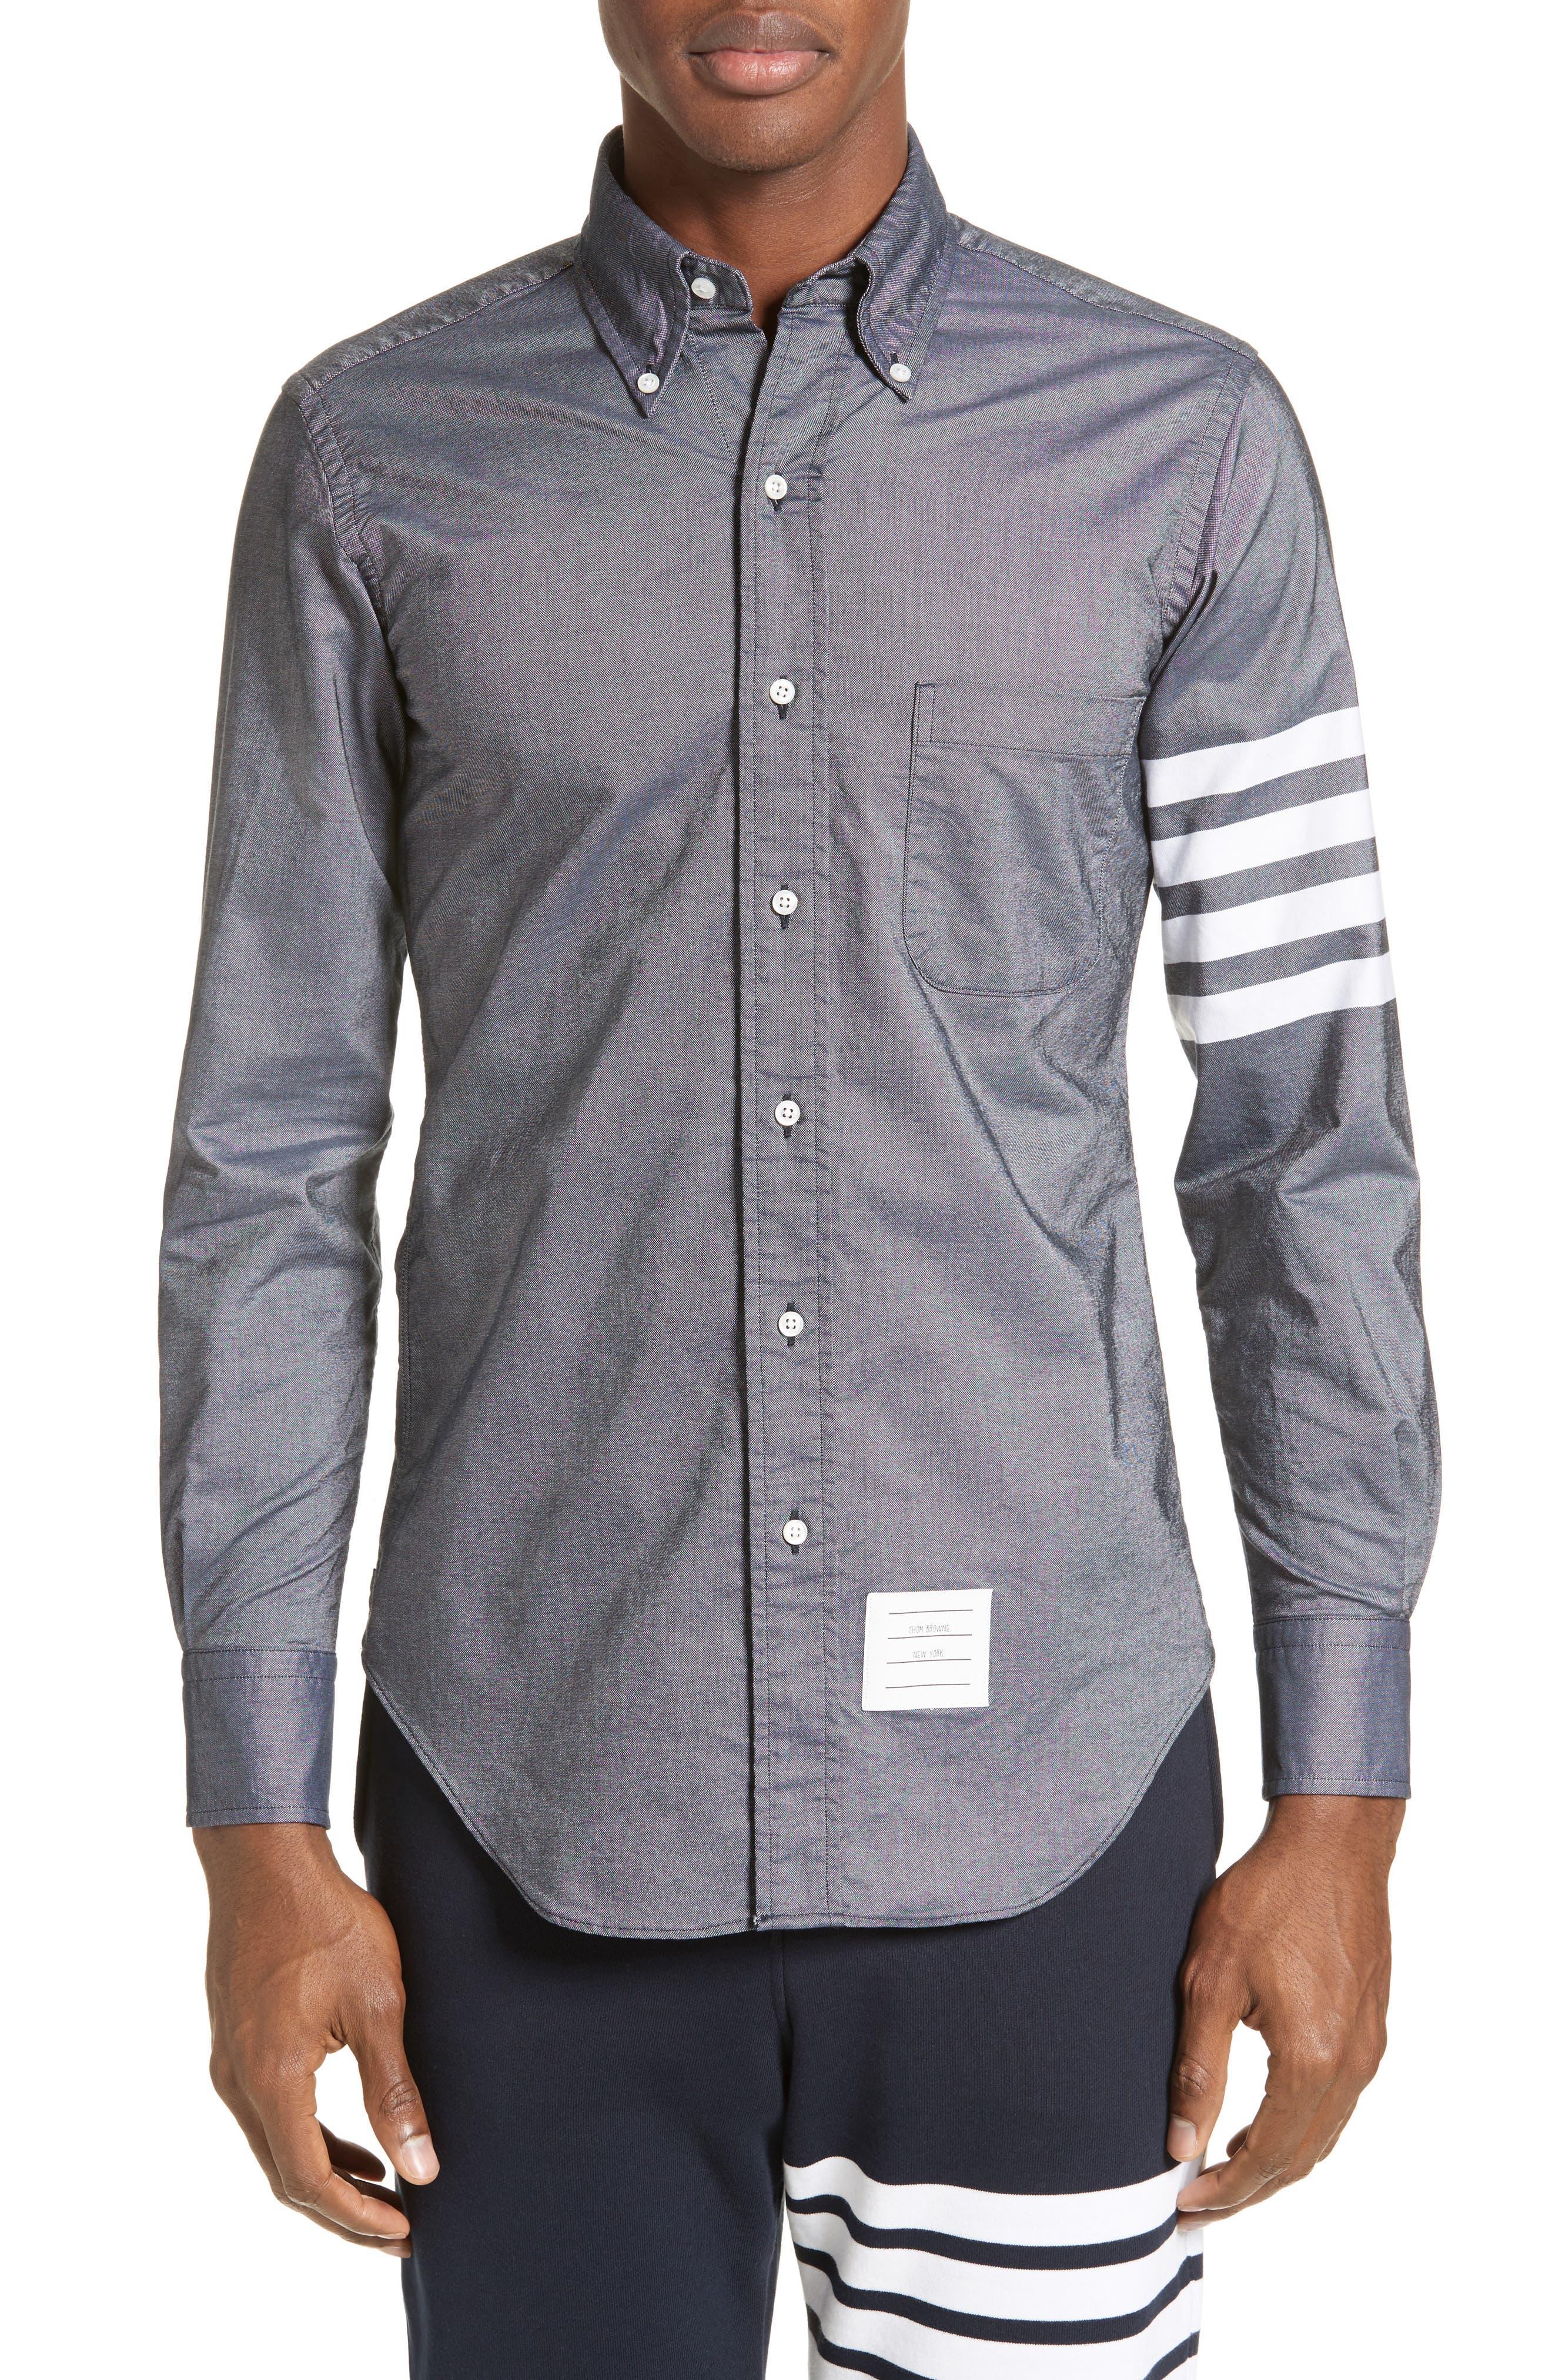 Main Image - Thom Browne Trim Fit Classic 4-Bar Oxford Shirt